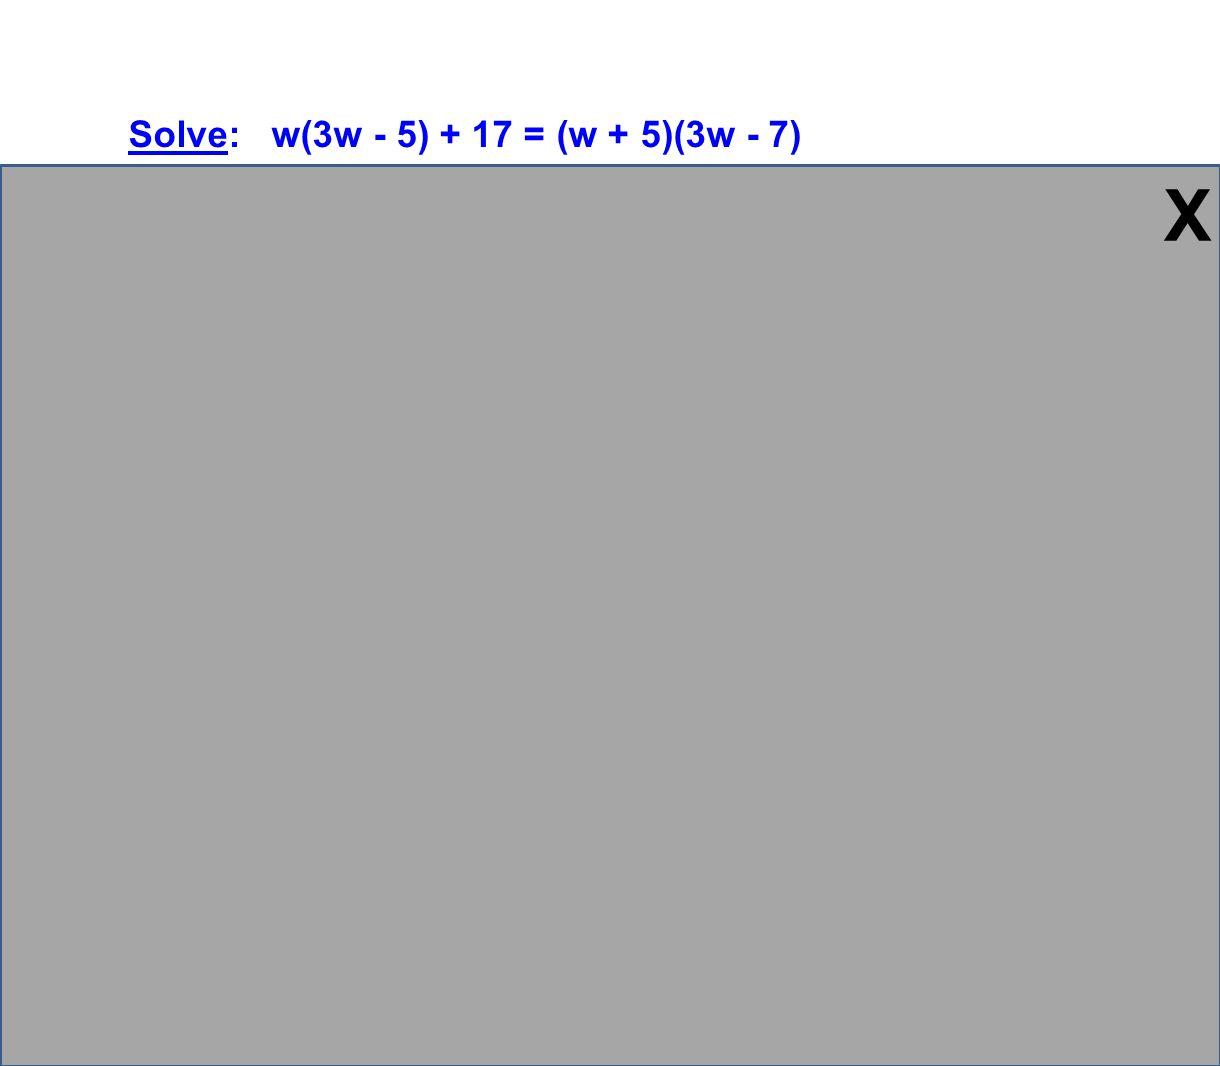 Solve: w(3w - 5) + 17 = (w + 5)(3w - 7) 3w 2 - 5w + 17 = 3w 2 + 15w - 7w - 35 3w 2 - 5w + 17 = 3w 2 + 8w - 35 -3w 2 -3w 2 -5w + 17 = 8w - 35 -8w -8w -